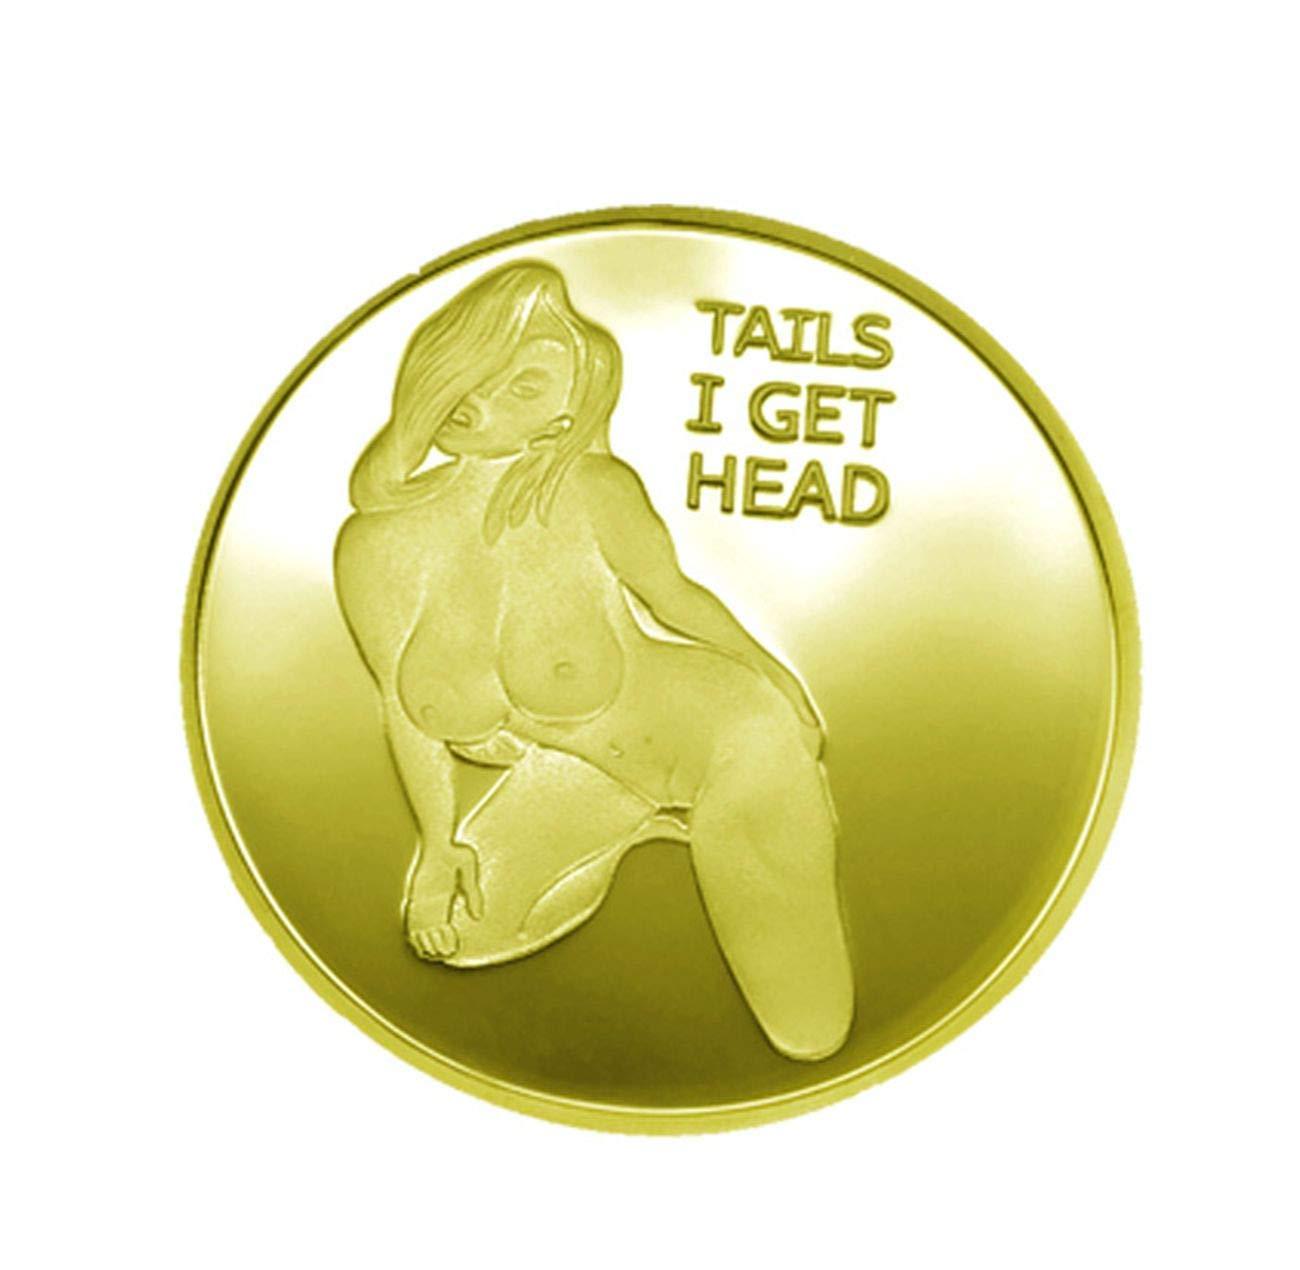 blinkee Sexy Stripper Good Luck Challenge Gold Coin